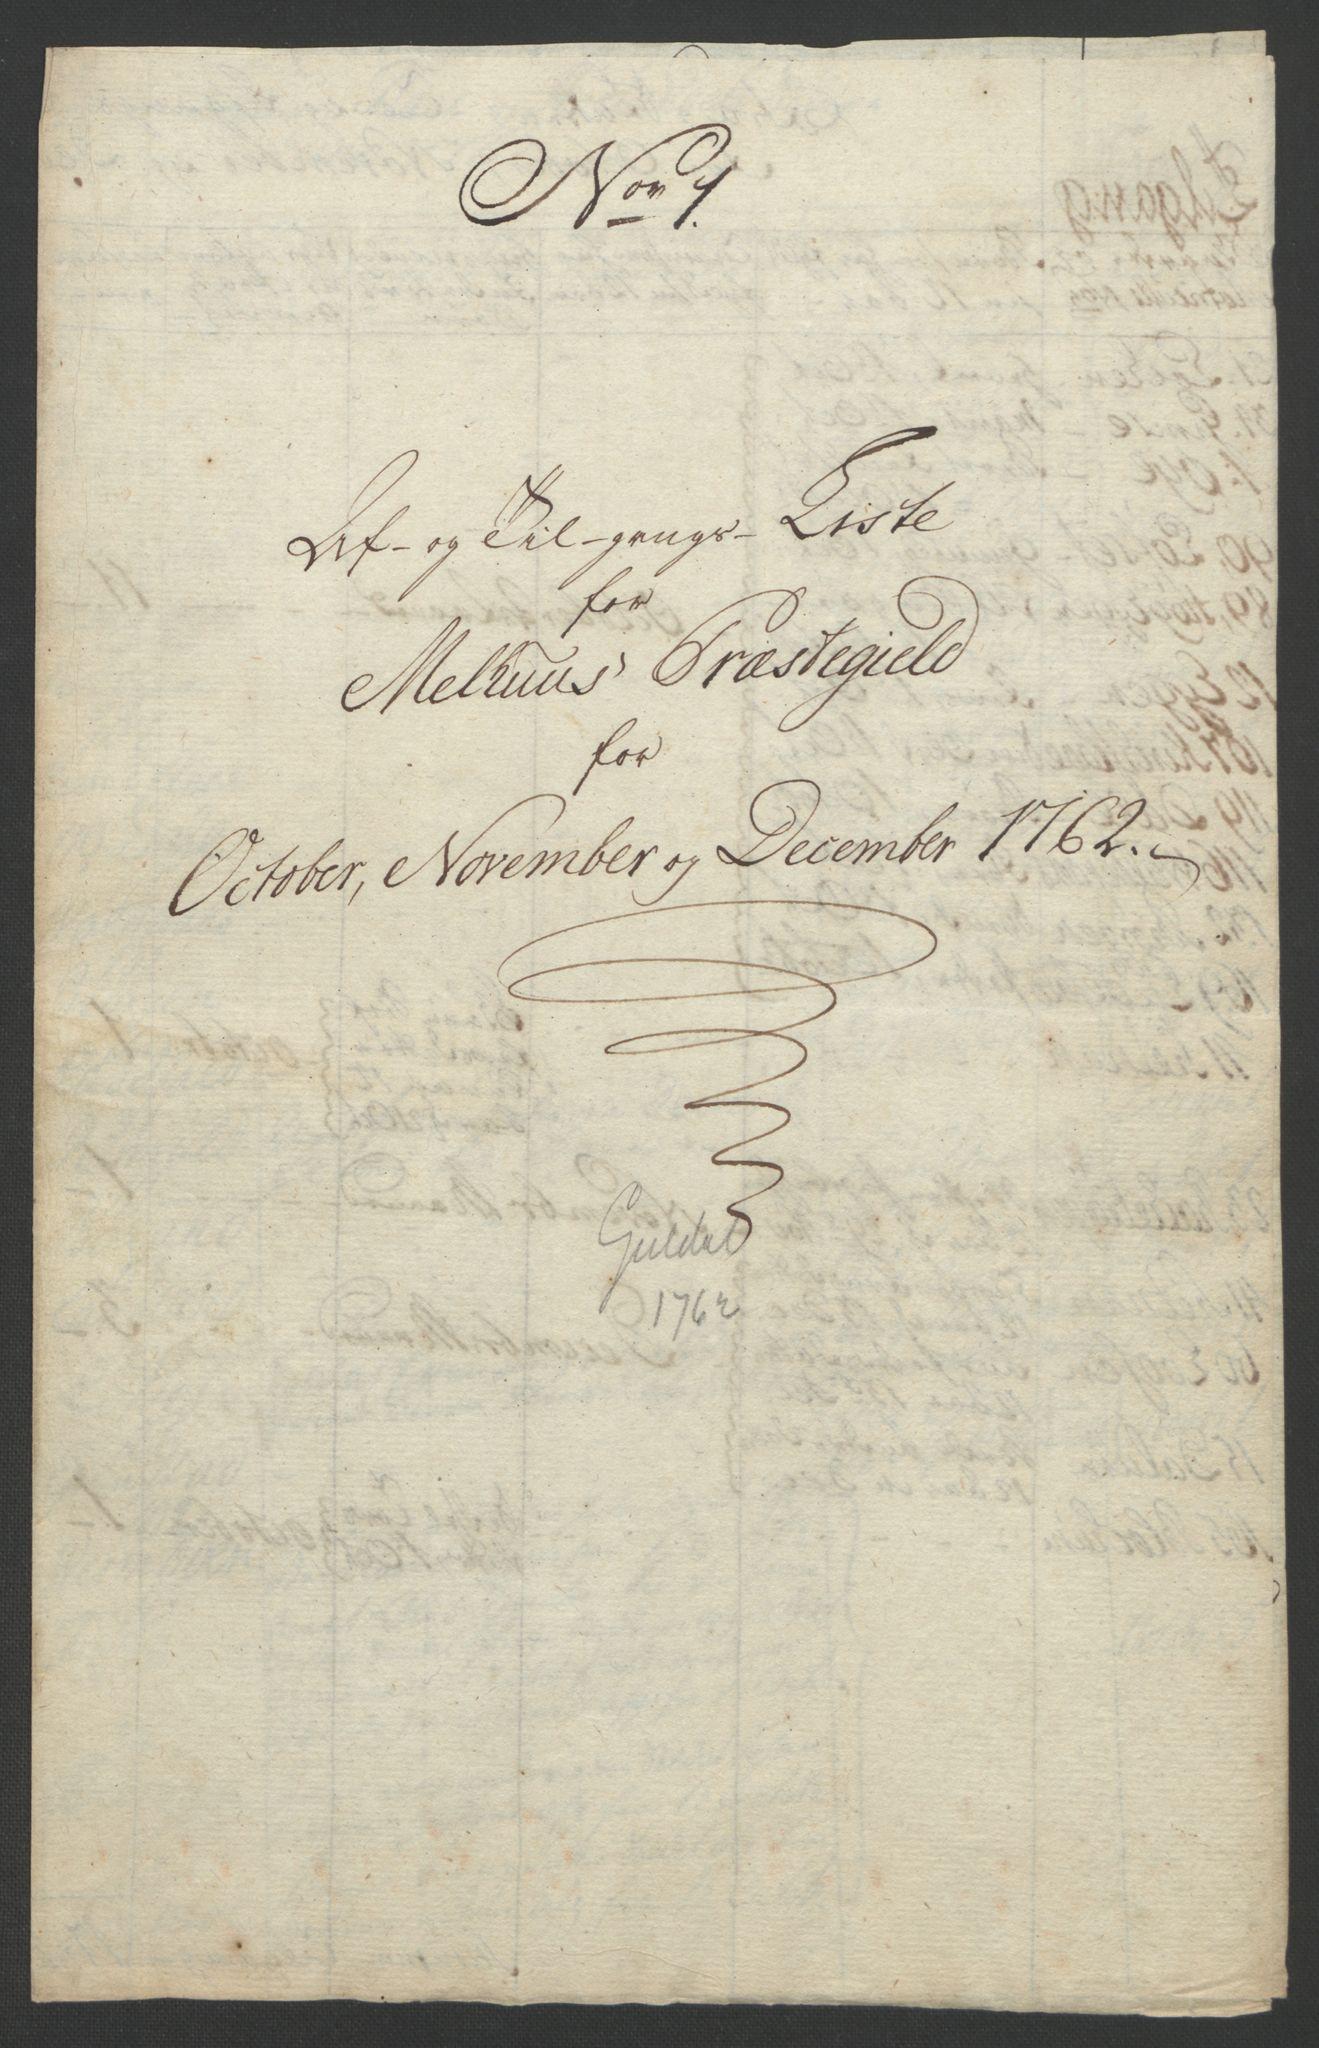 RA, Rentekammeret inntil 1814, Realistisk ordnet avdeling, Ol/L0021: [Gg 10]: Ekstraskatten, 23.09.1762. Orkdal og Gauldal, 1762-1767, s. 234